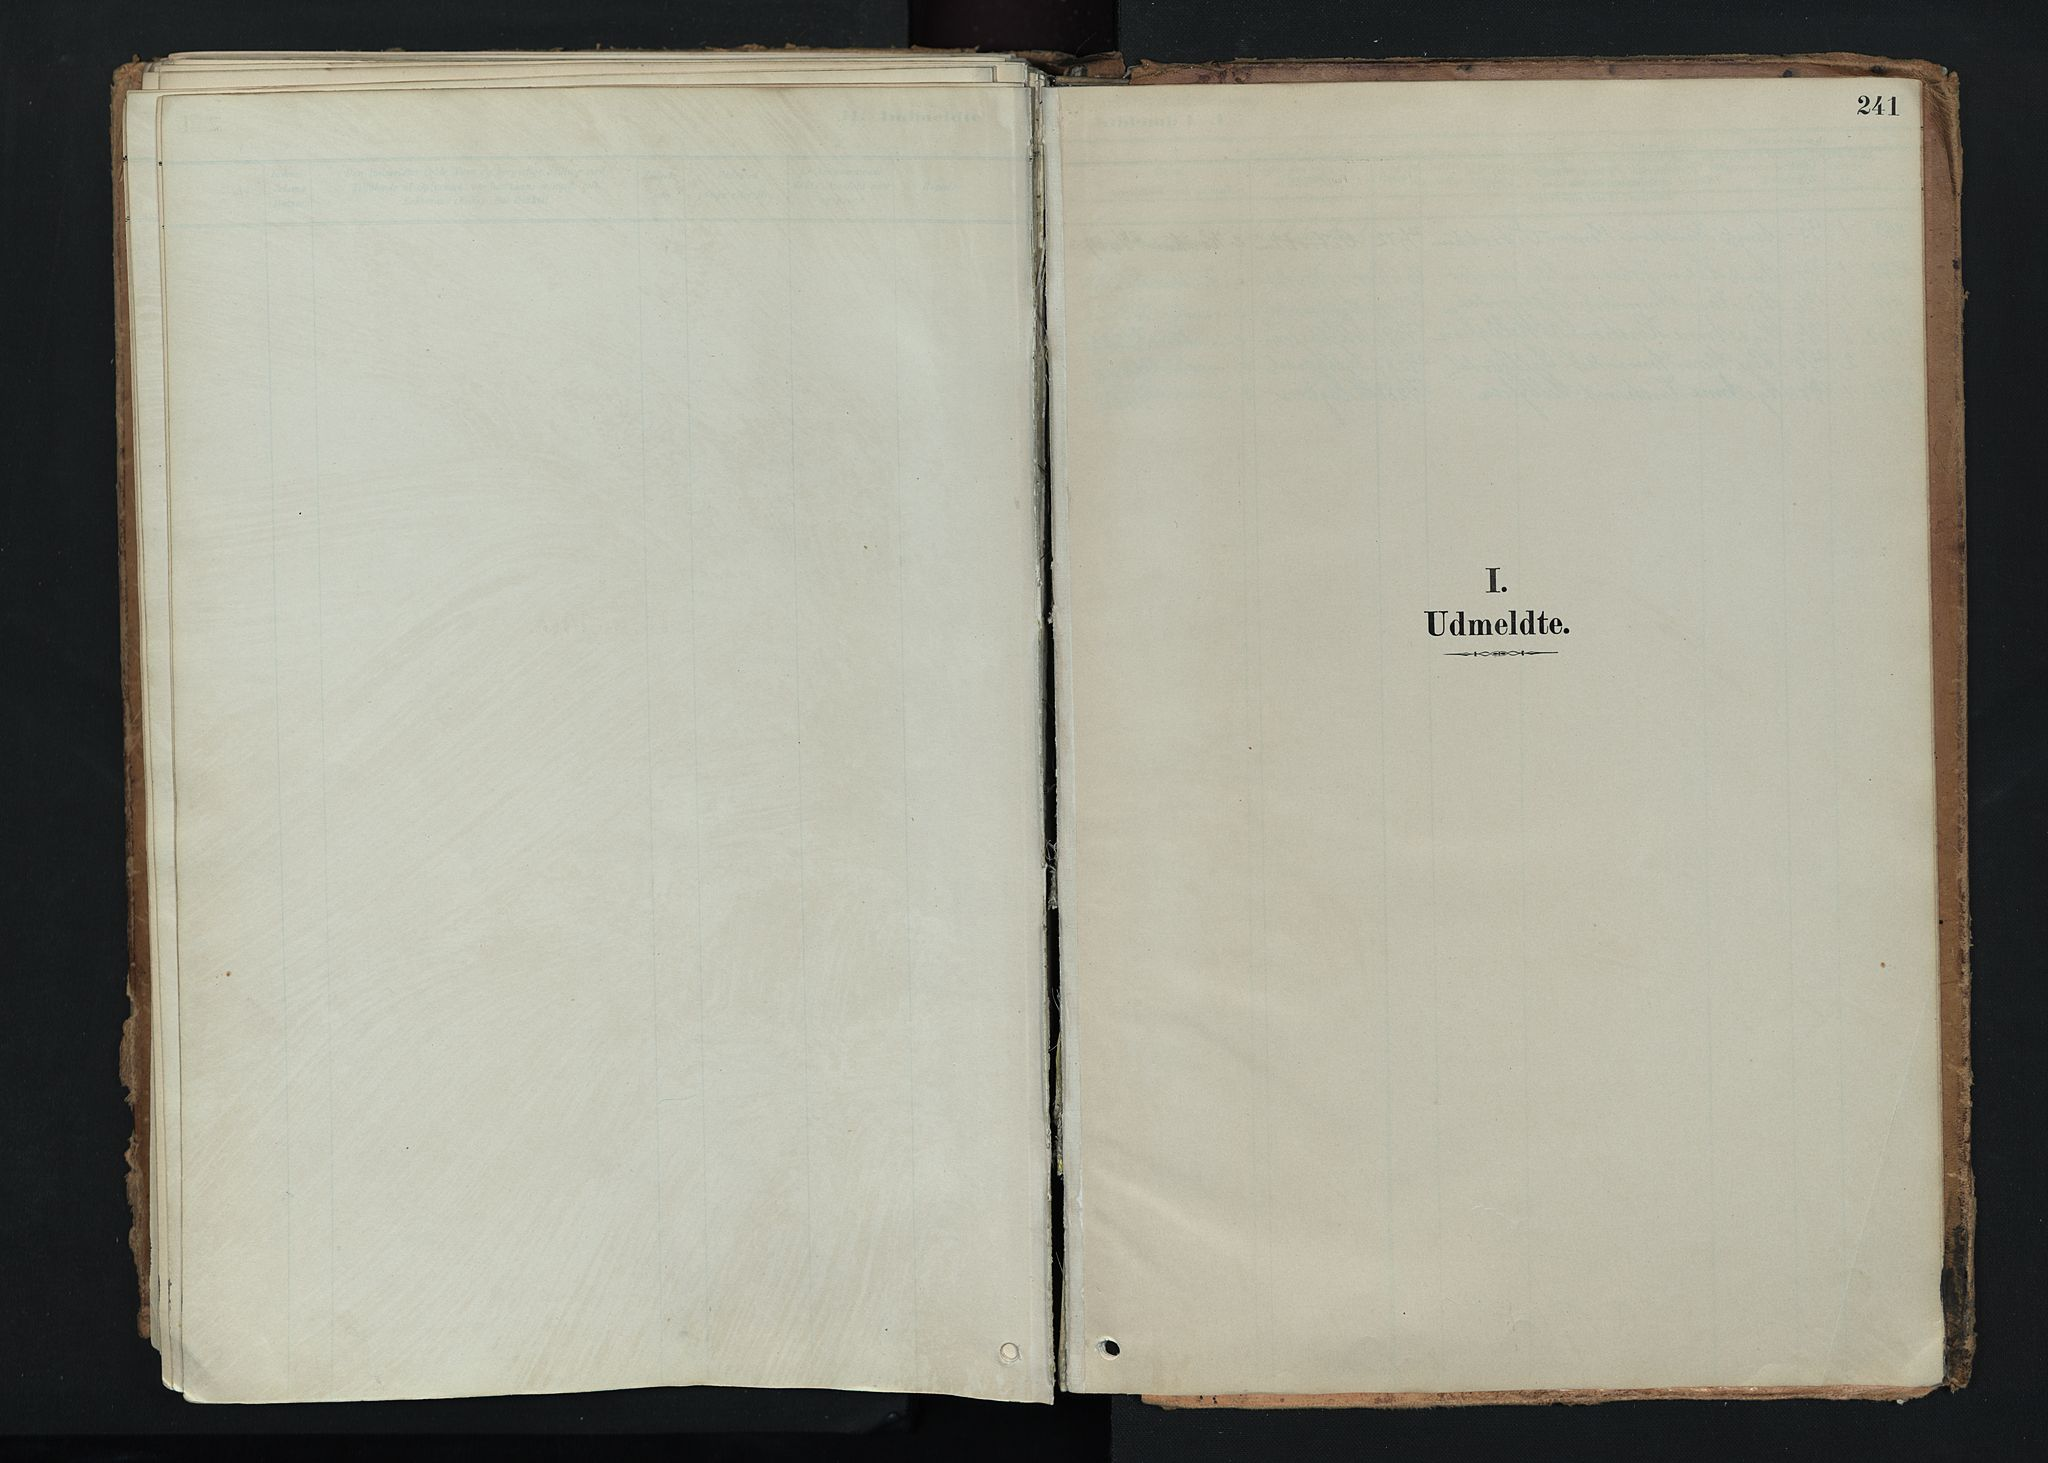 SAH, Nord-Fron prestekontor, Ministerialbok nr. 5, 1884-1914, s. 241